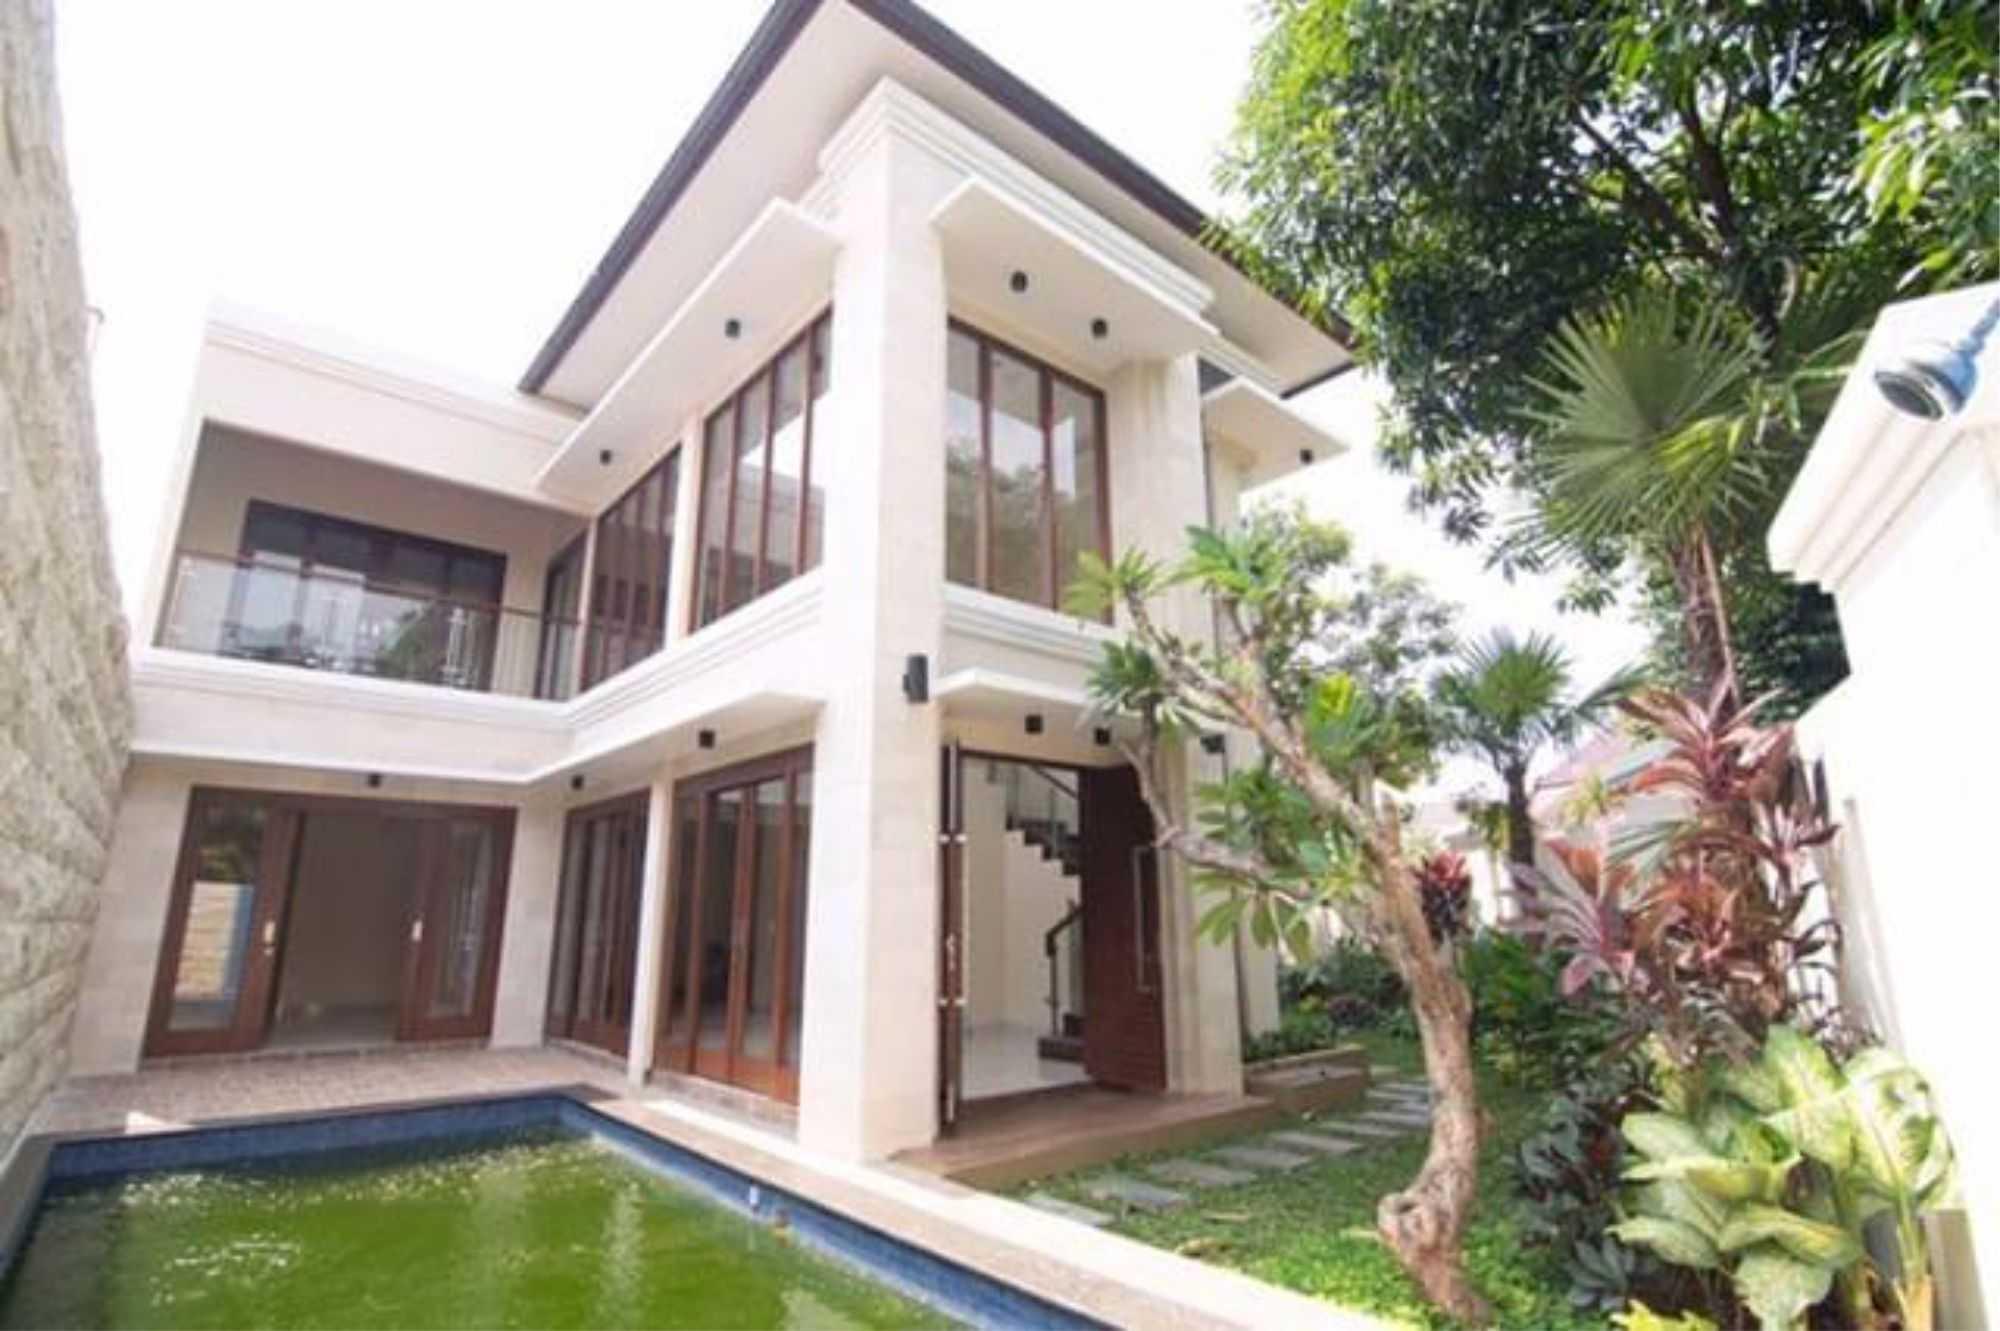 Emporio Architect Progress Konstruksi Rumah Villa Bali Tropis 385 @ Jakarta Jakarta, Daerah Khusus Ibukota Jakarta, Indonesia Jakarta, Daerah Khusus Ibukota Jakarta, Indonesia Emporio-Architect-Progress-Konstruksi-Rumah-Villa-Bali-Tropis-385-Jakarta  76583